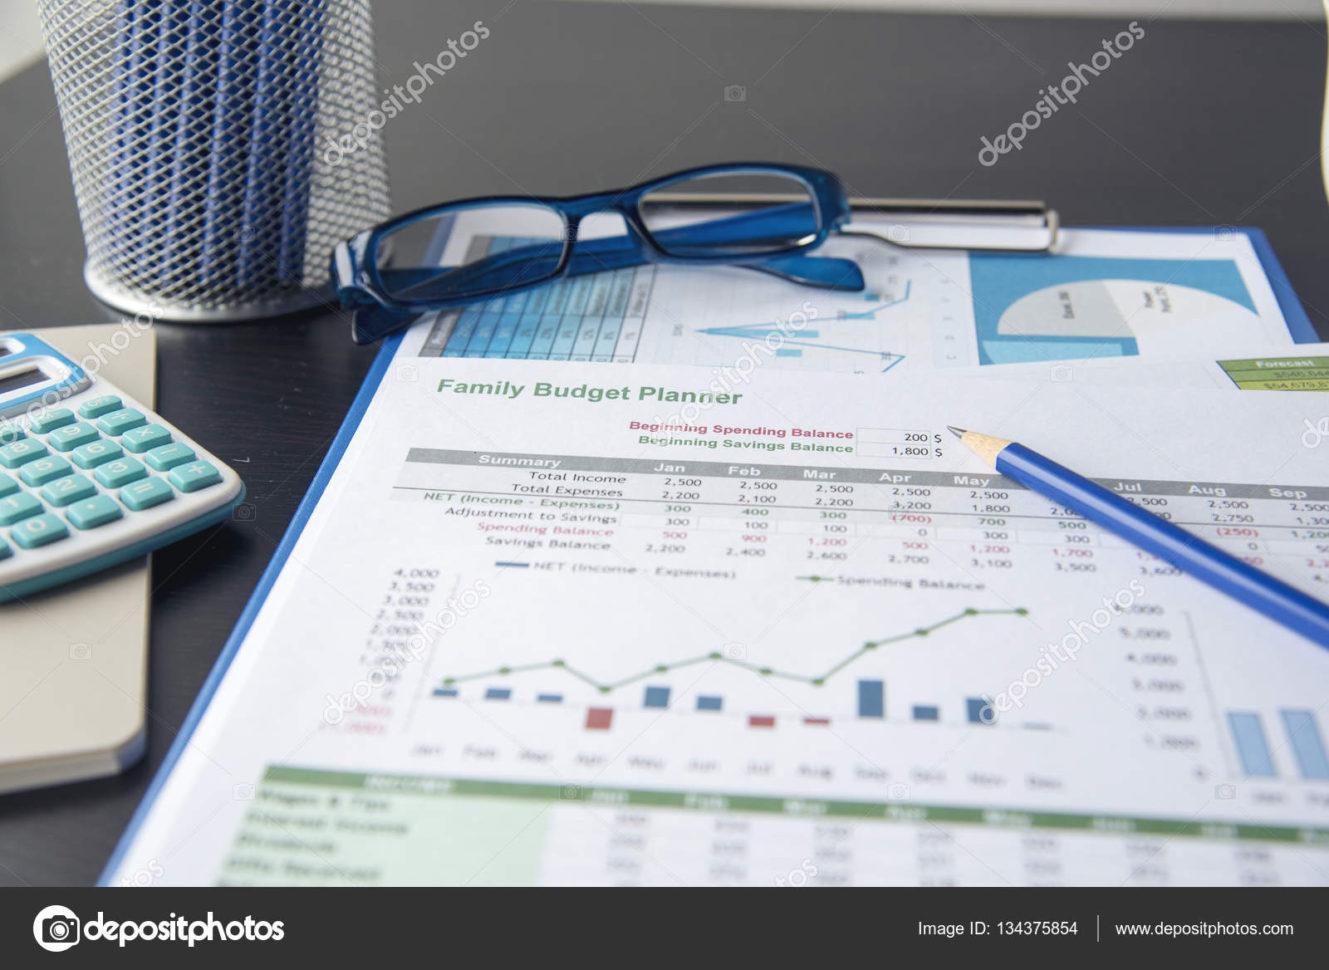 Financial Savings Plan Spreadsheet Within Family Budget Planner. Saving And Spending Money Plan. Spreadsheet